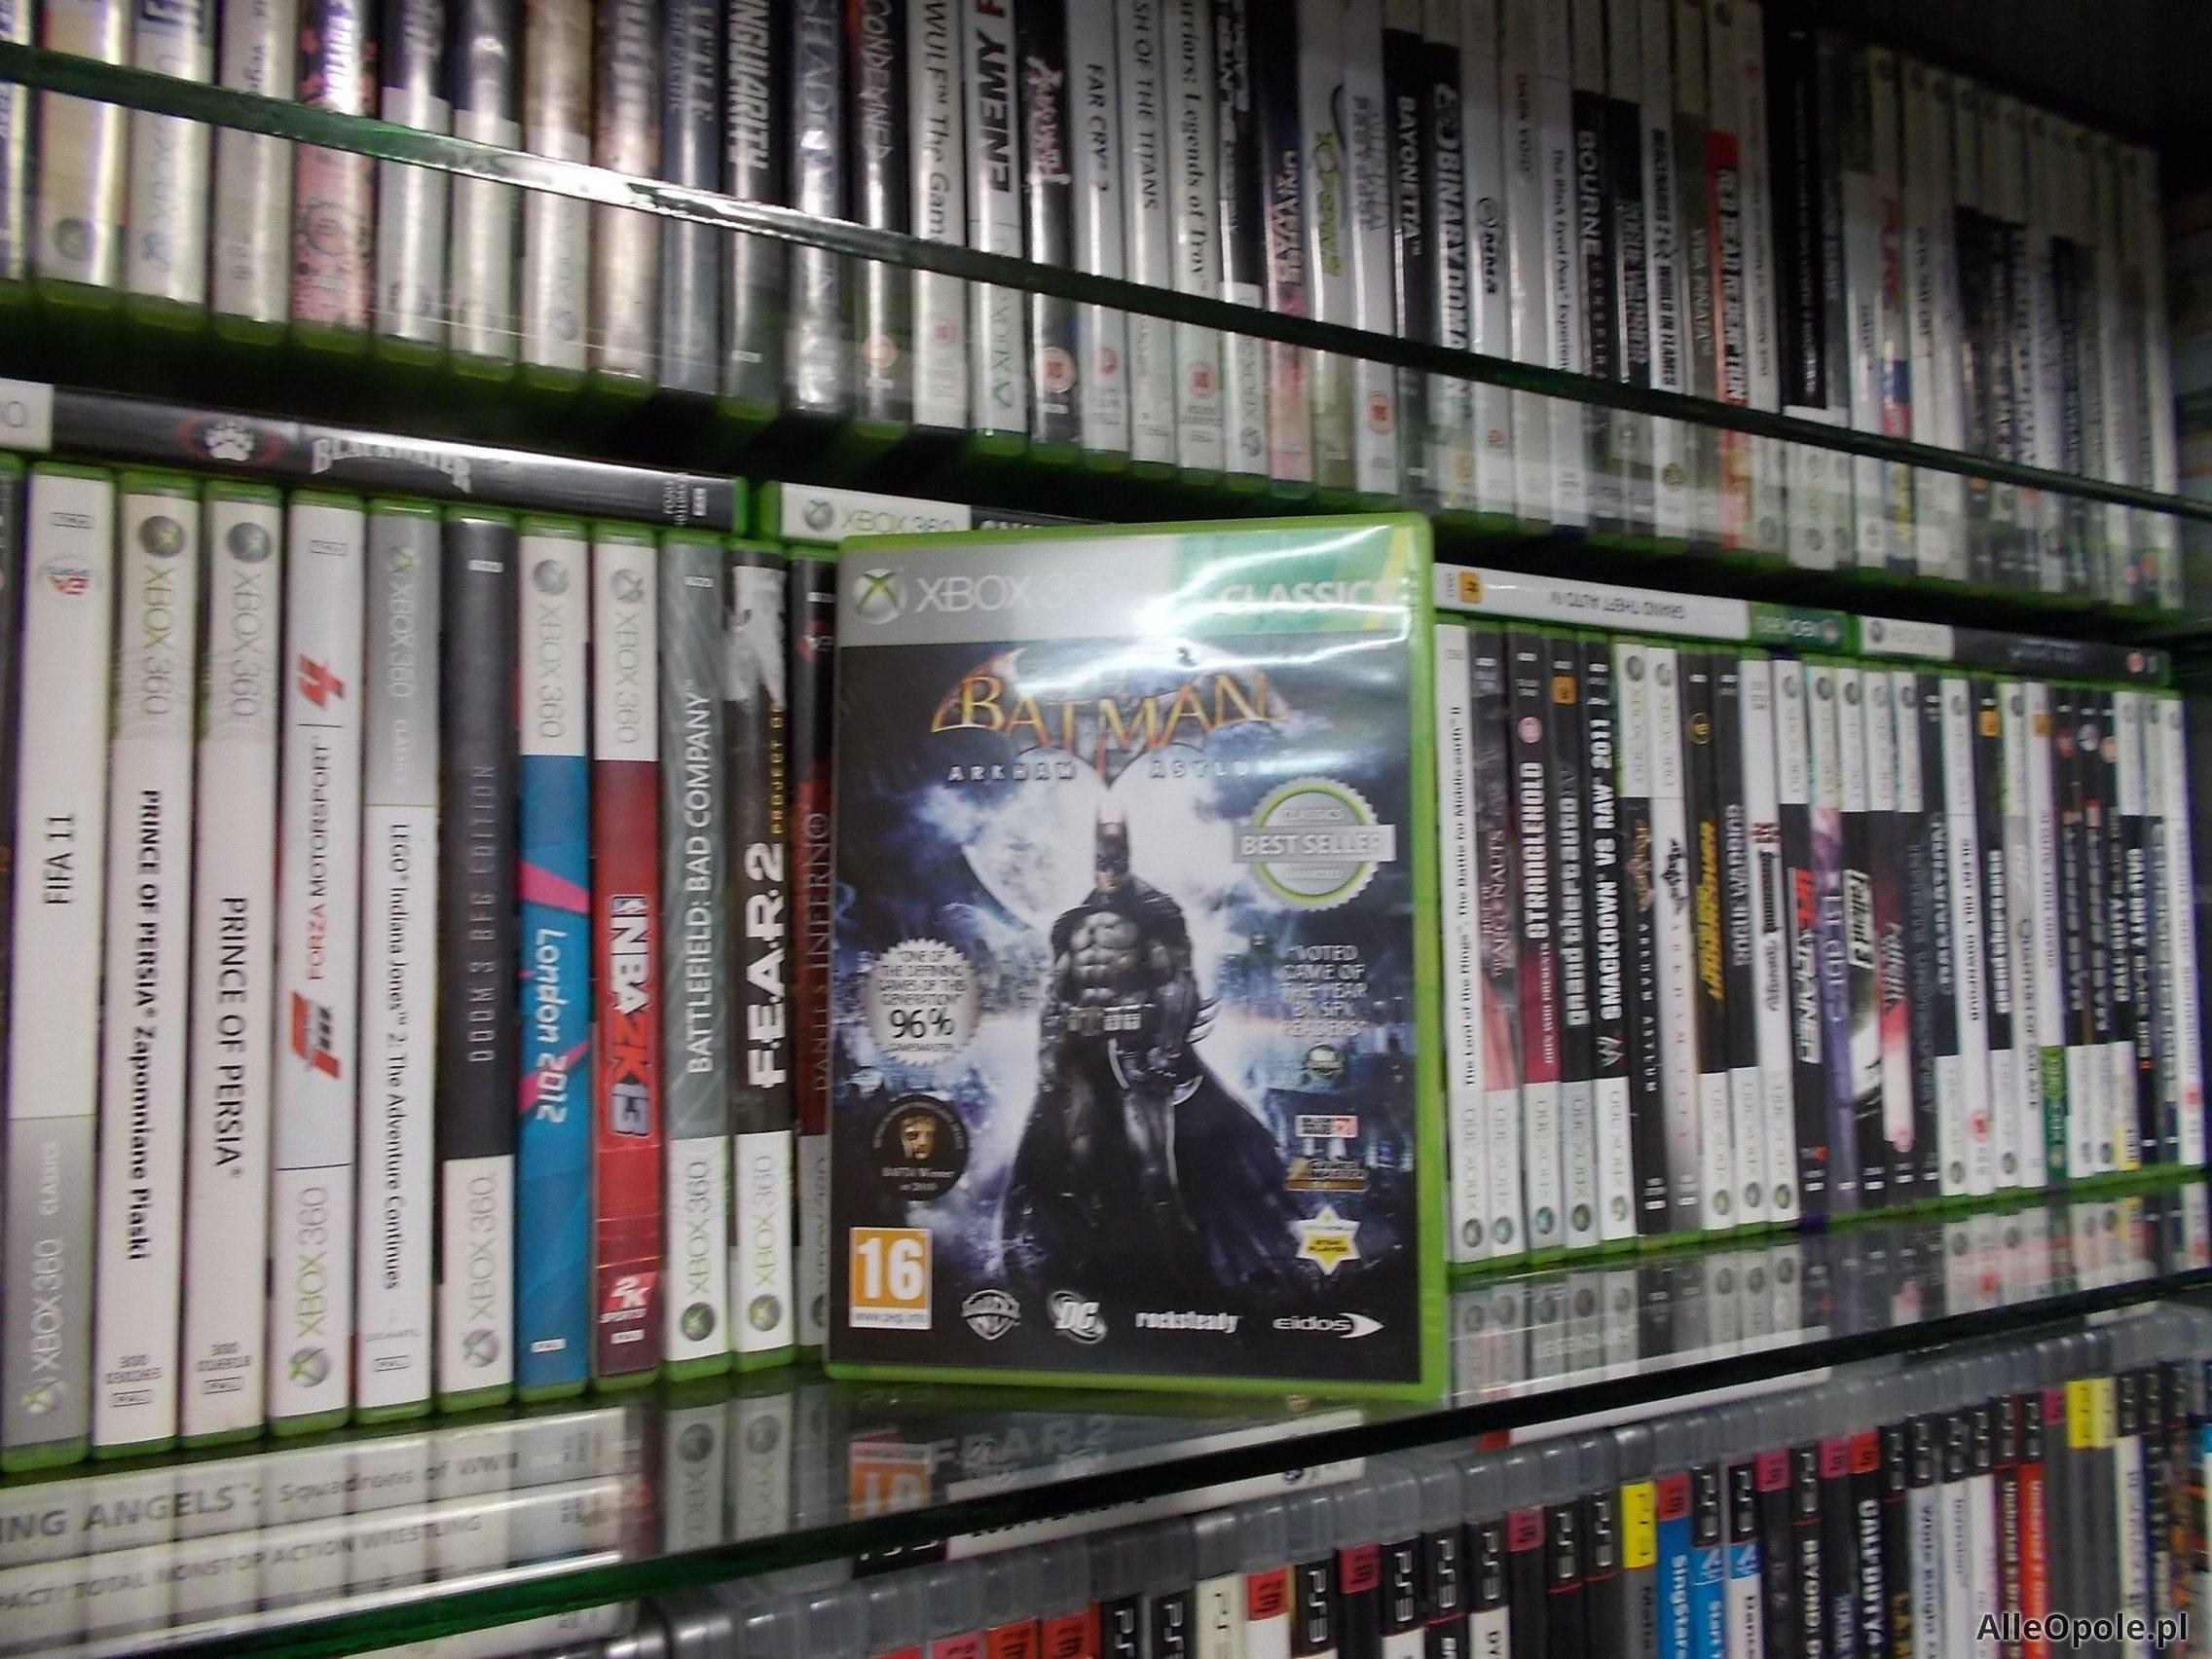 "Batman Arkham Asylum - GRA XBOX 360 Sklep ""ALFA"" Opole 0183 - AlleOpole.pl (Opole)"